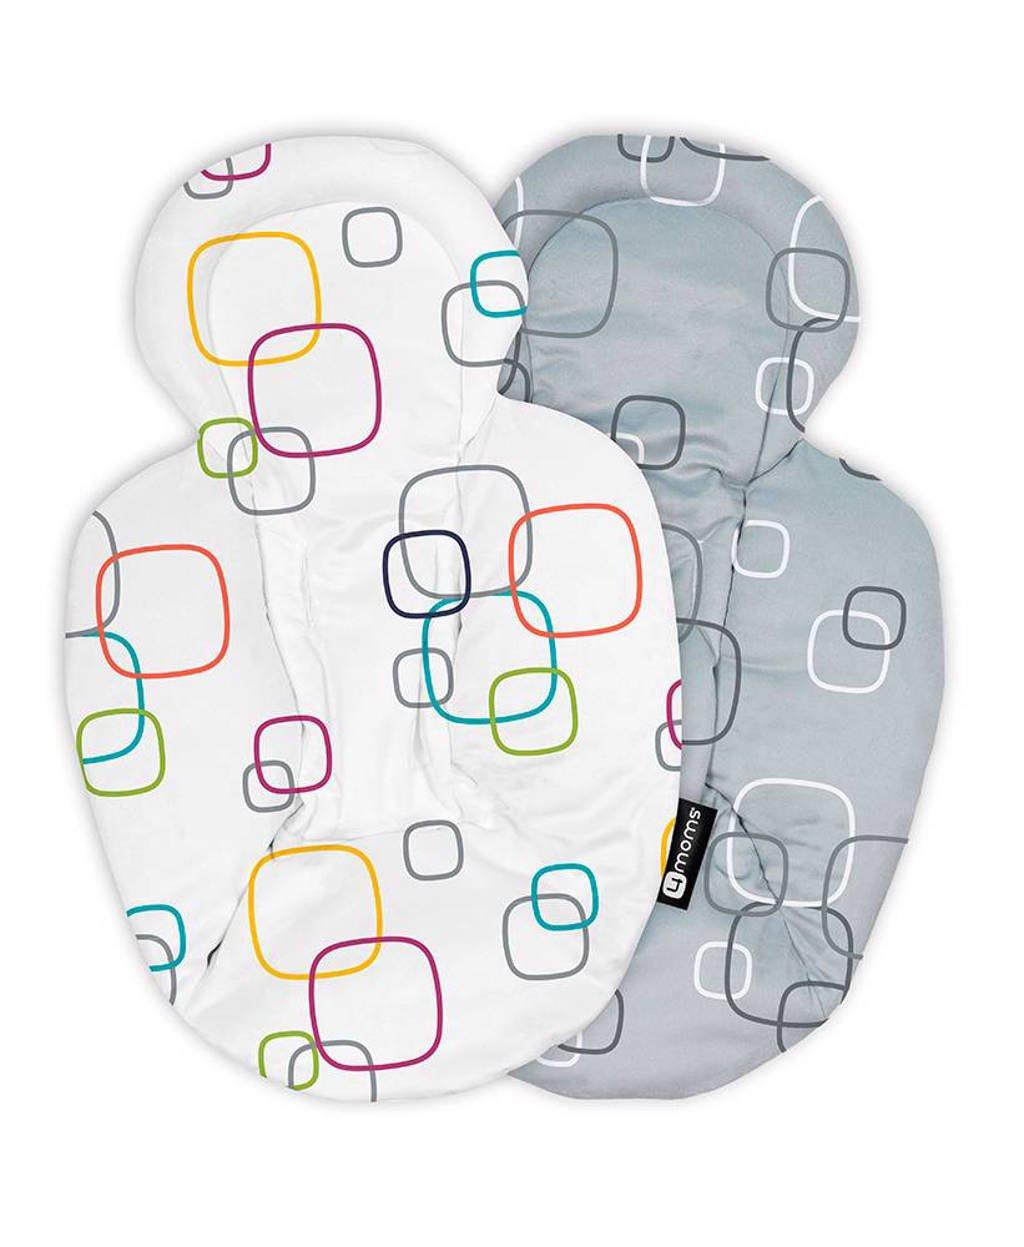 4moms Snug stoelverkleiner newborn multicolor/grijs, Multicolor/grijs